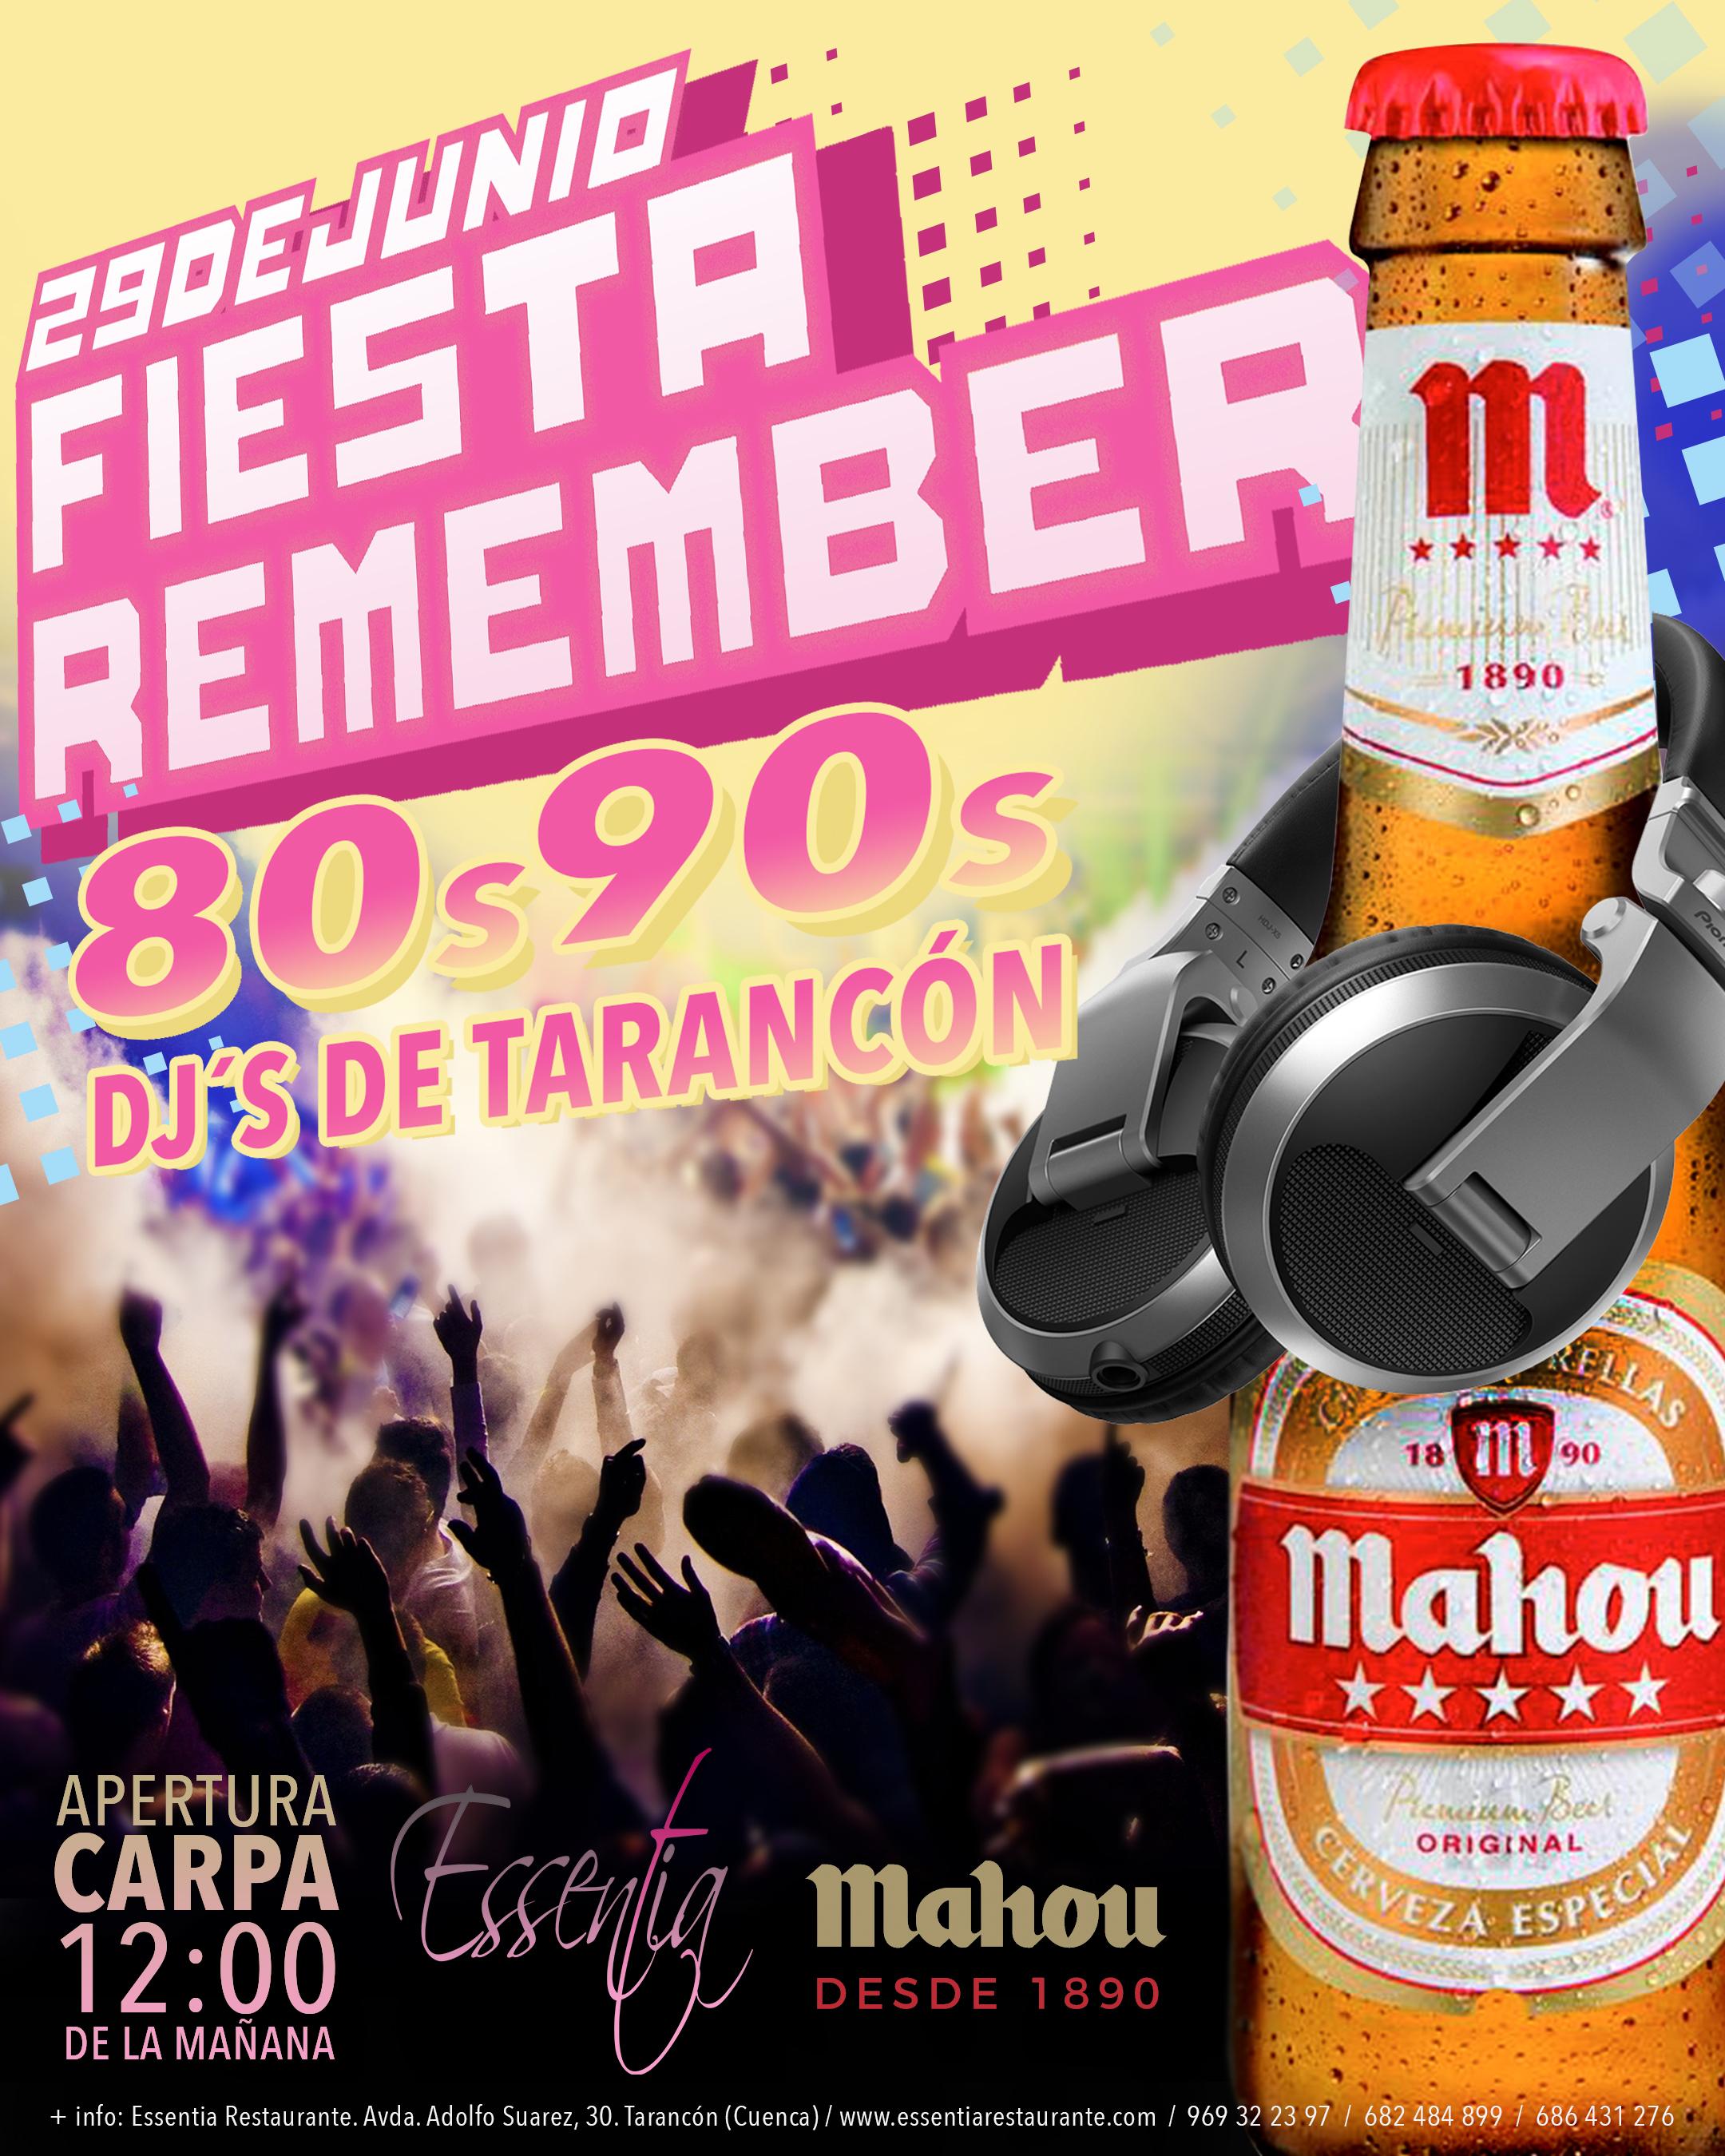 fiesta dj mahou.jpg